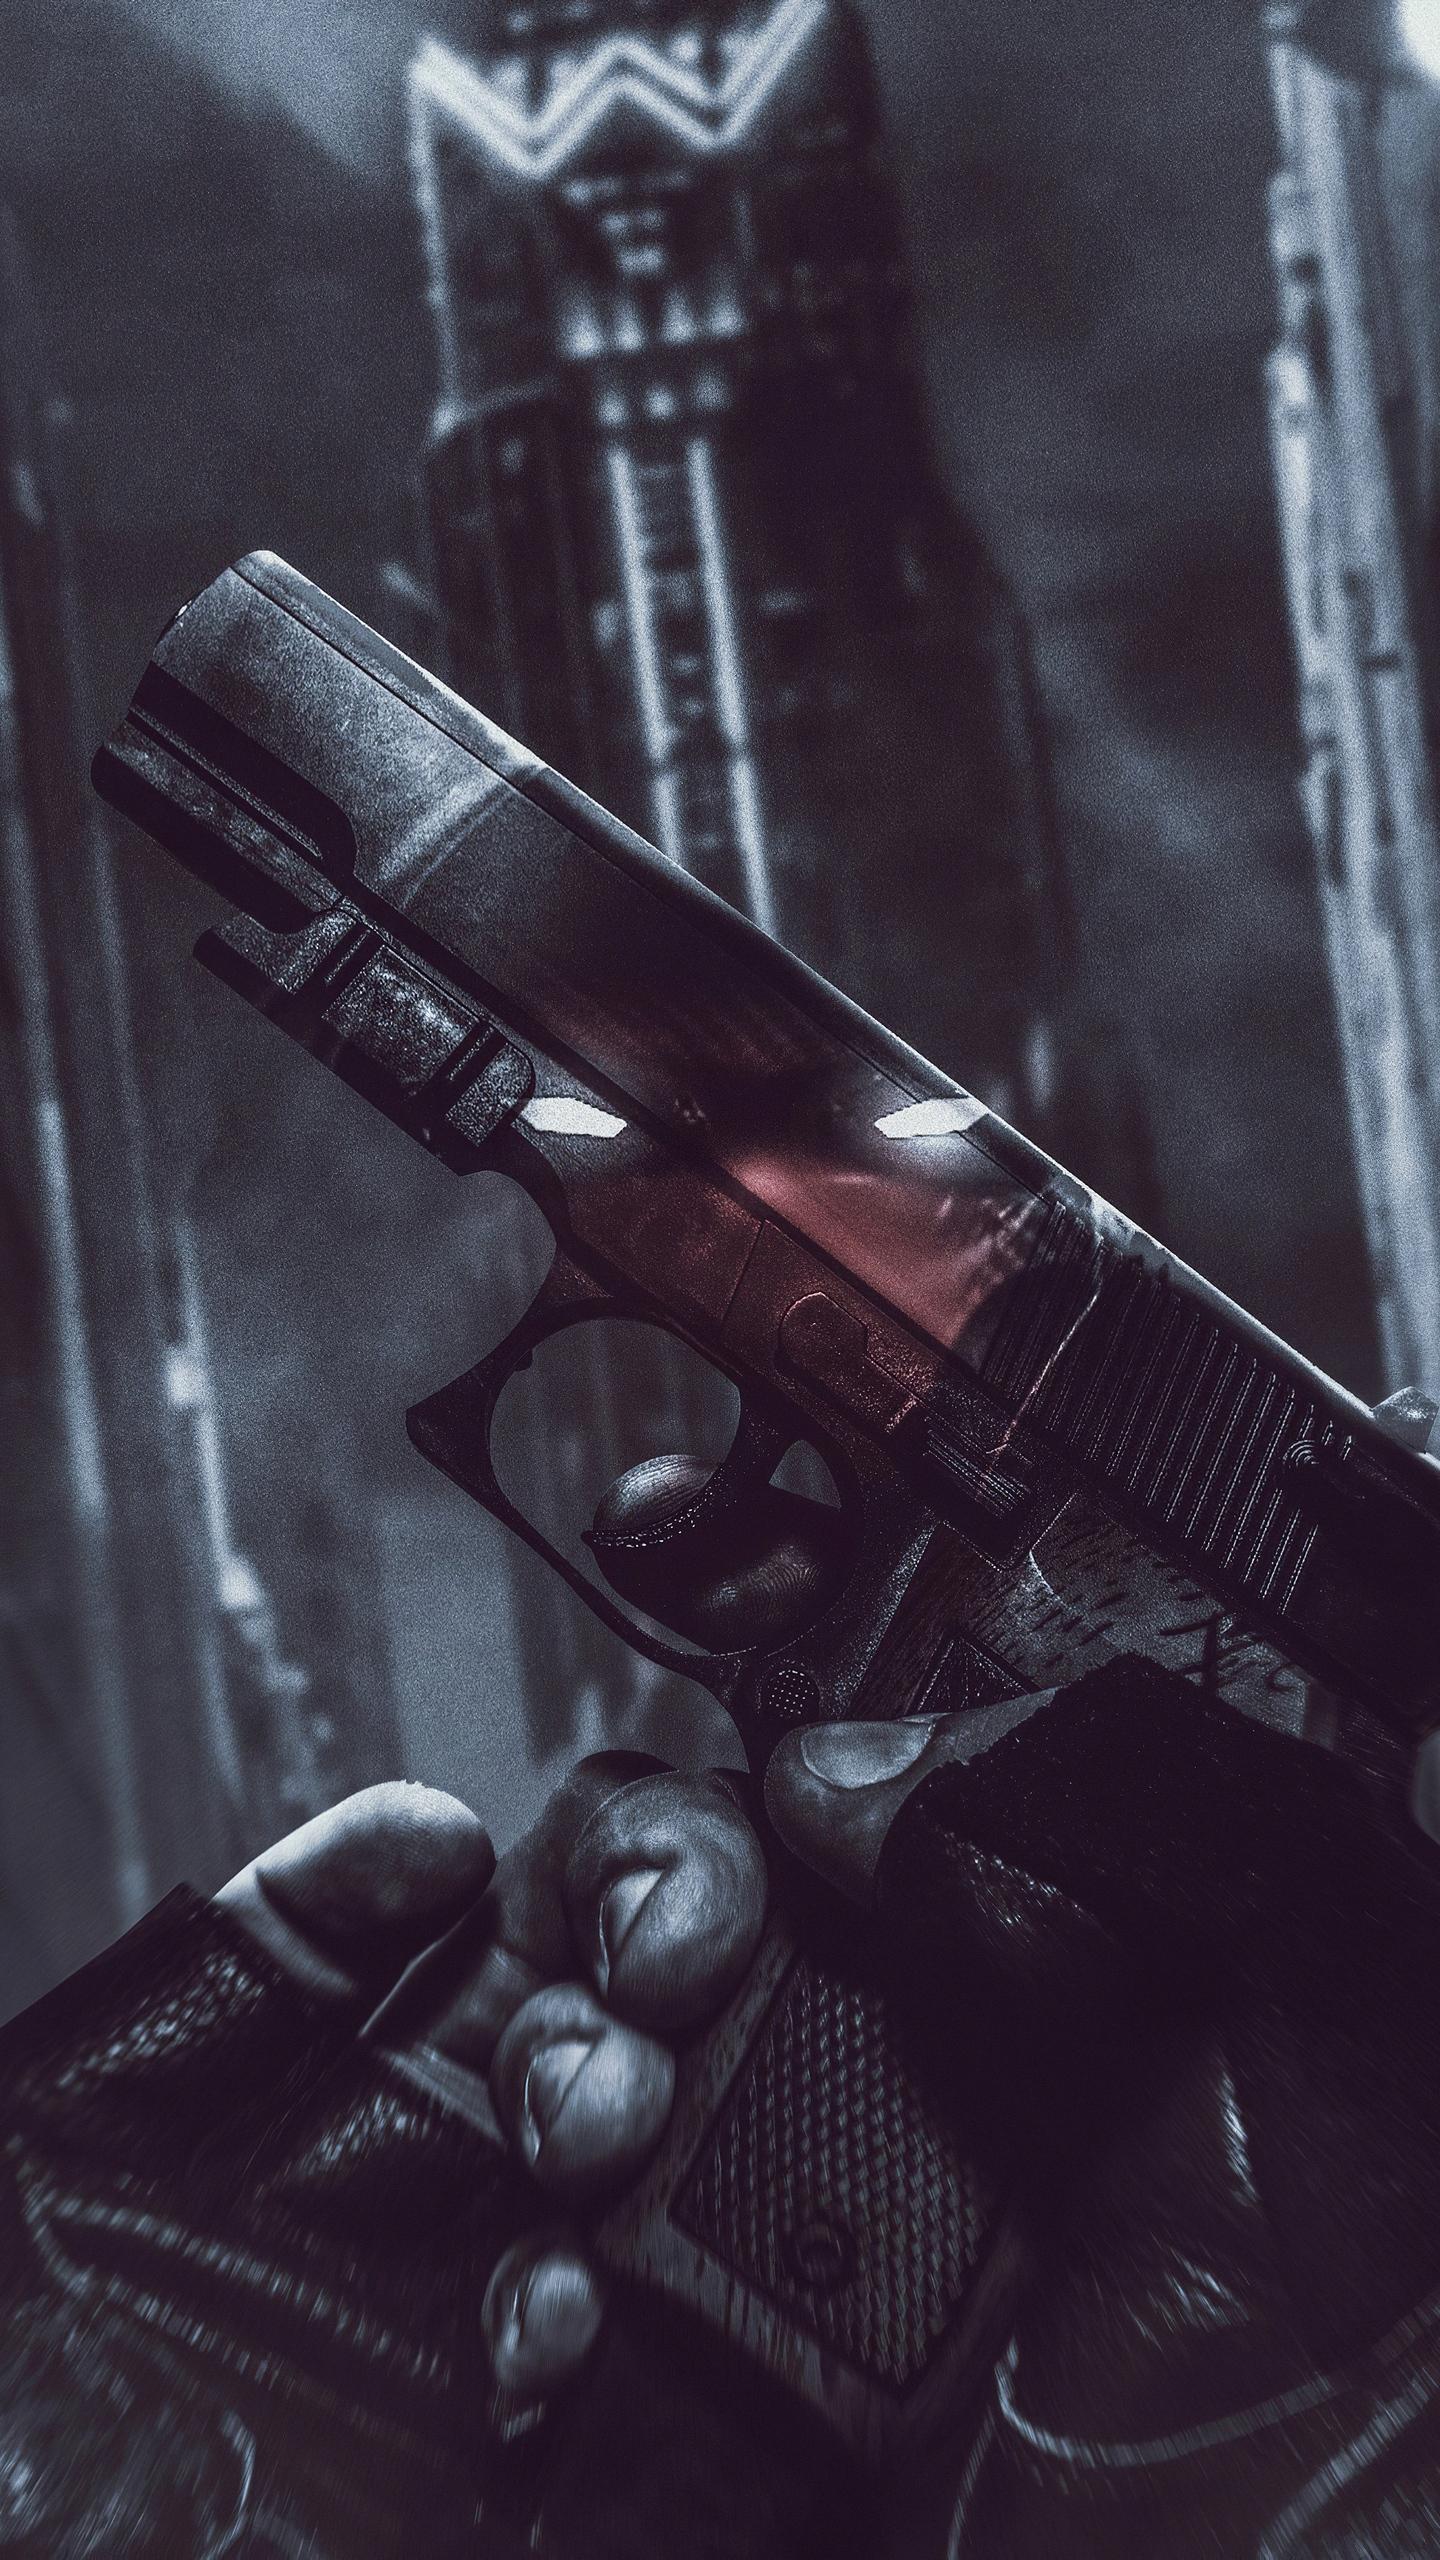 redhood-gun-l9.jpg